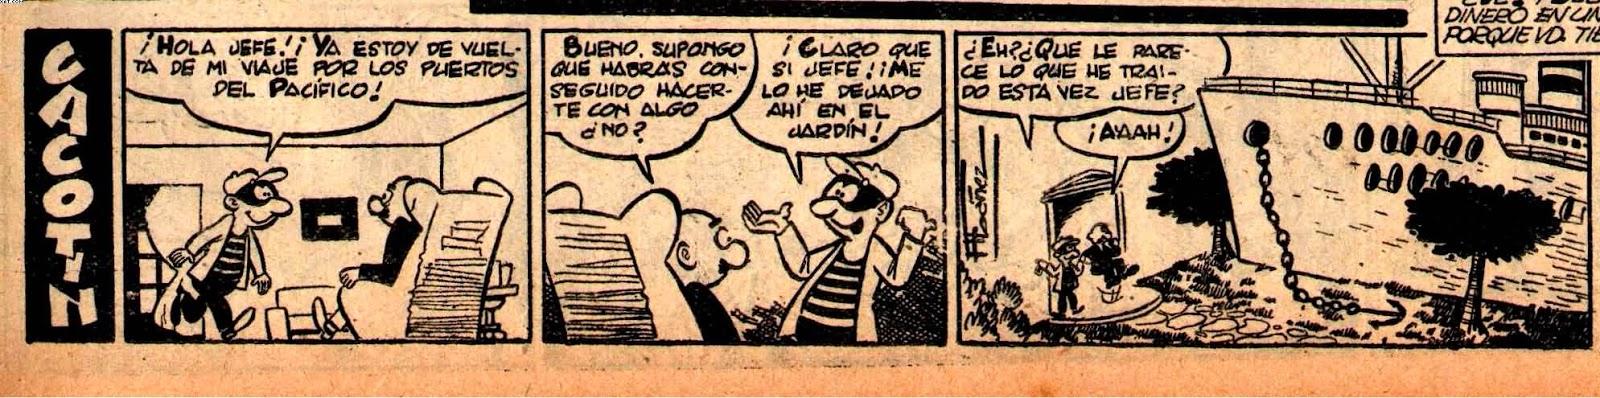 Cacotin, La Risa 2ª época nº 91